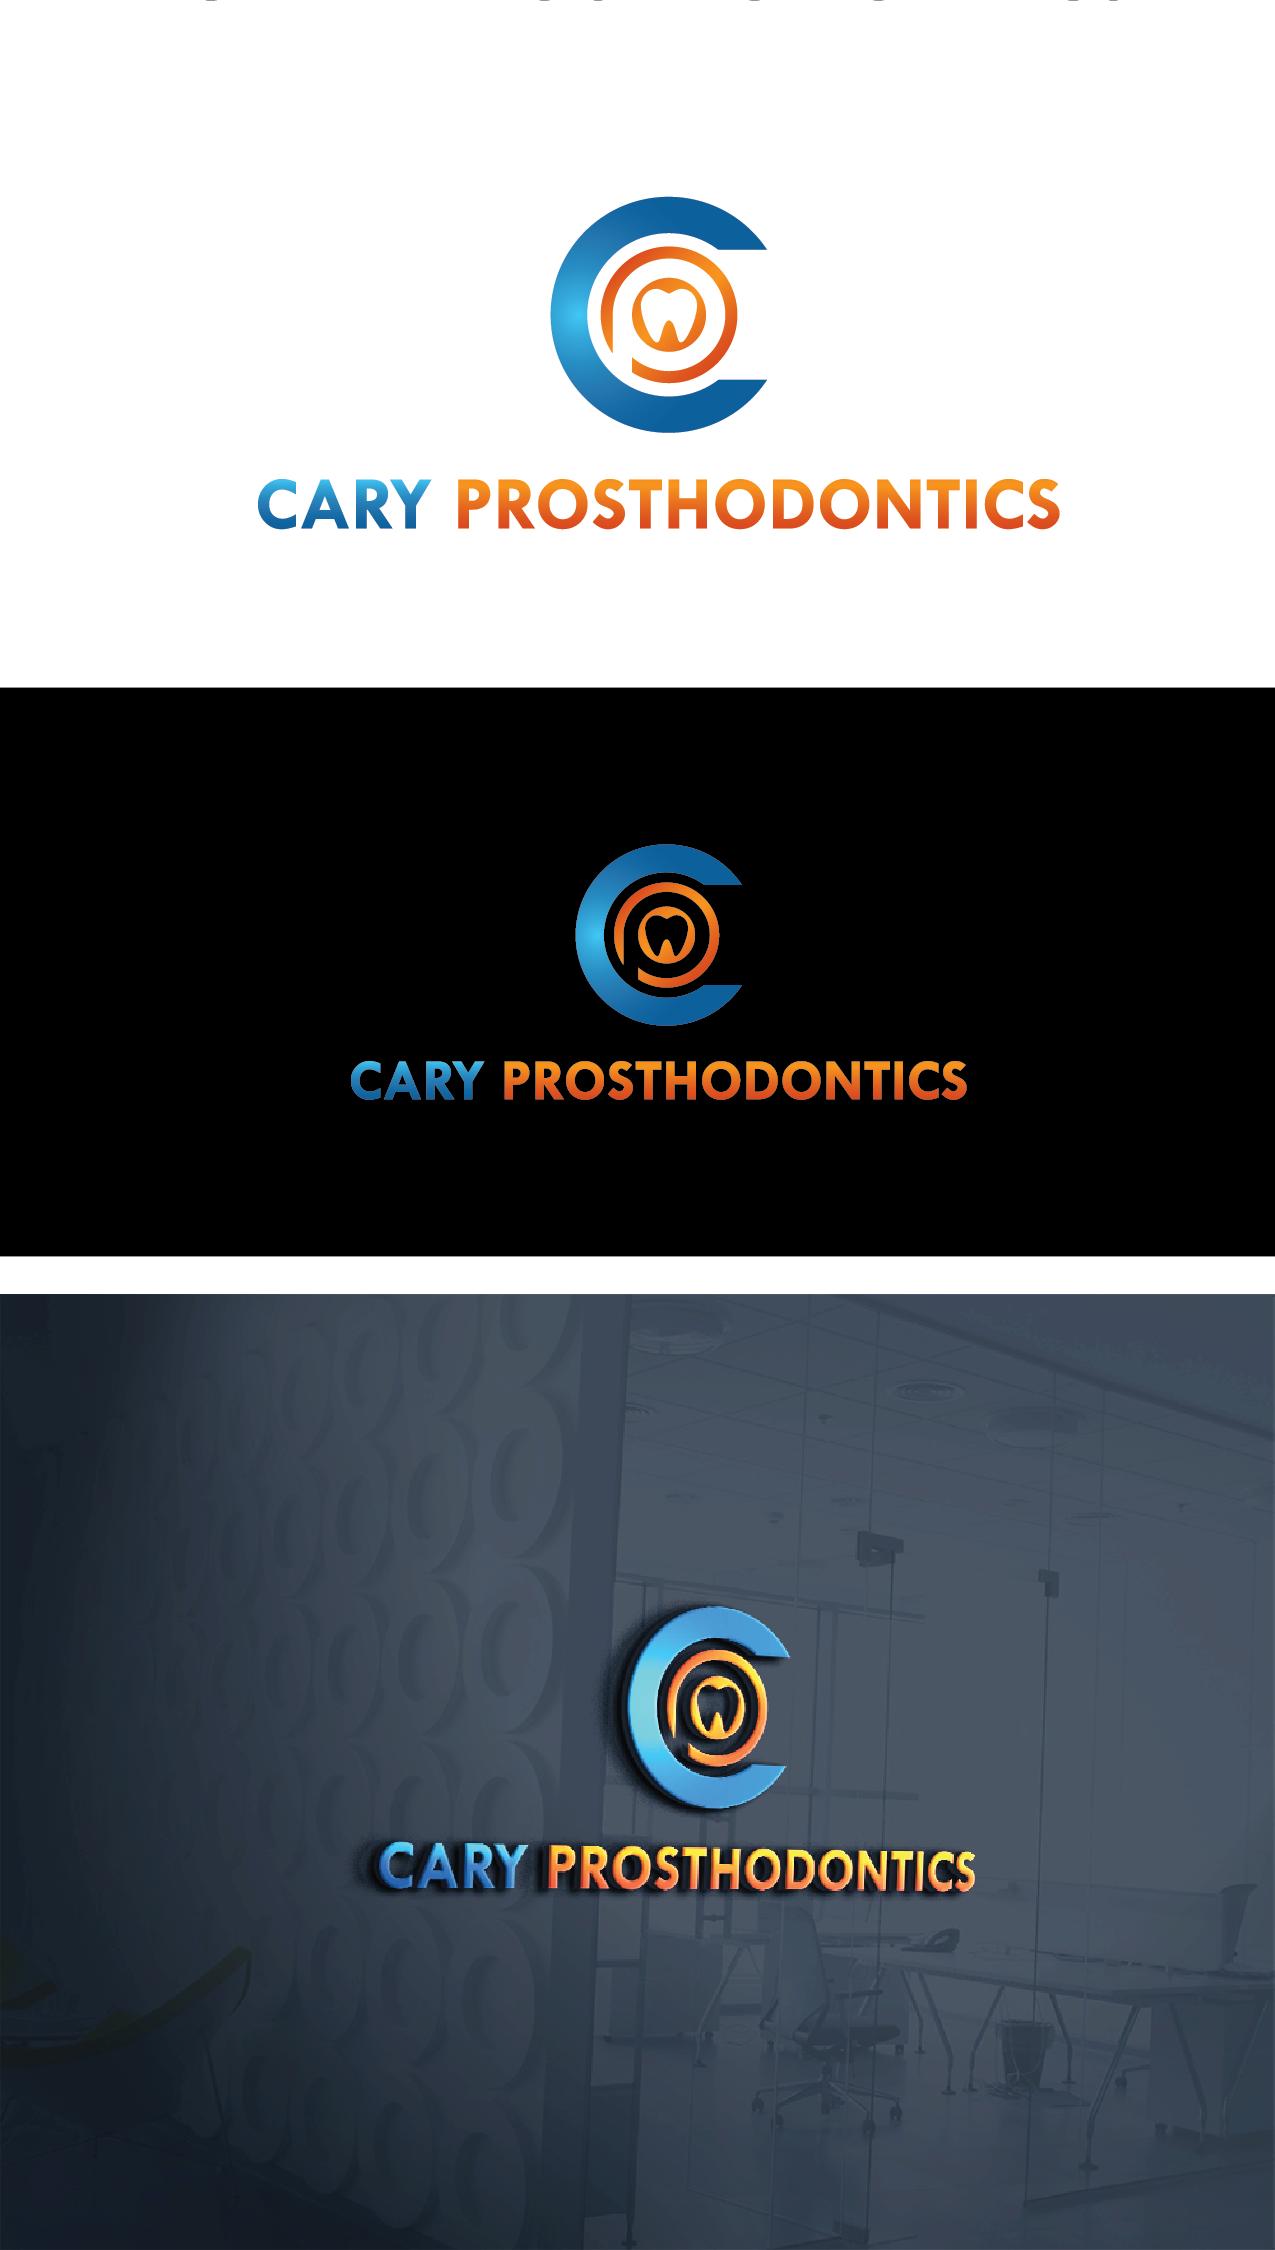 Logo Design by Private User - Entry No. 12 in the Logo Design Contest Cary Prosthodontics Logo Design.